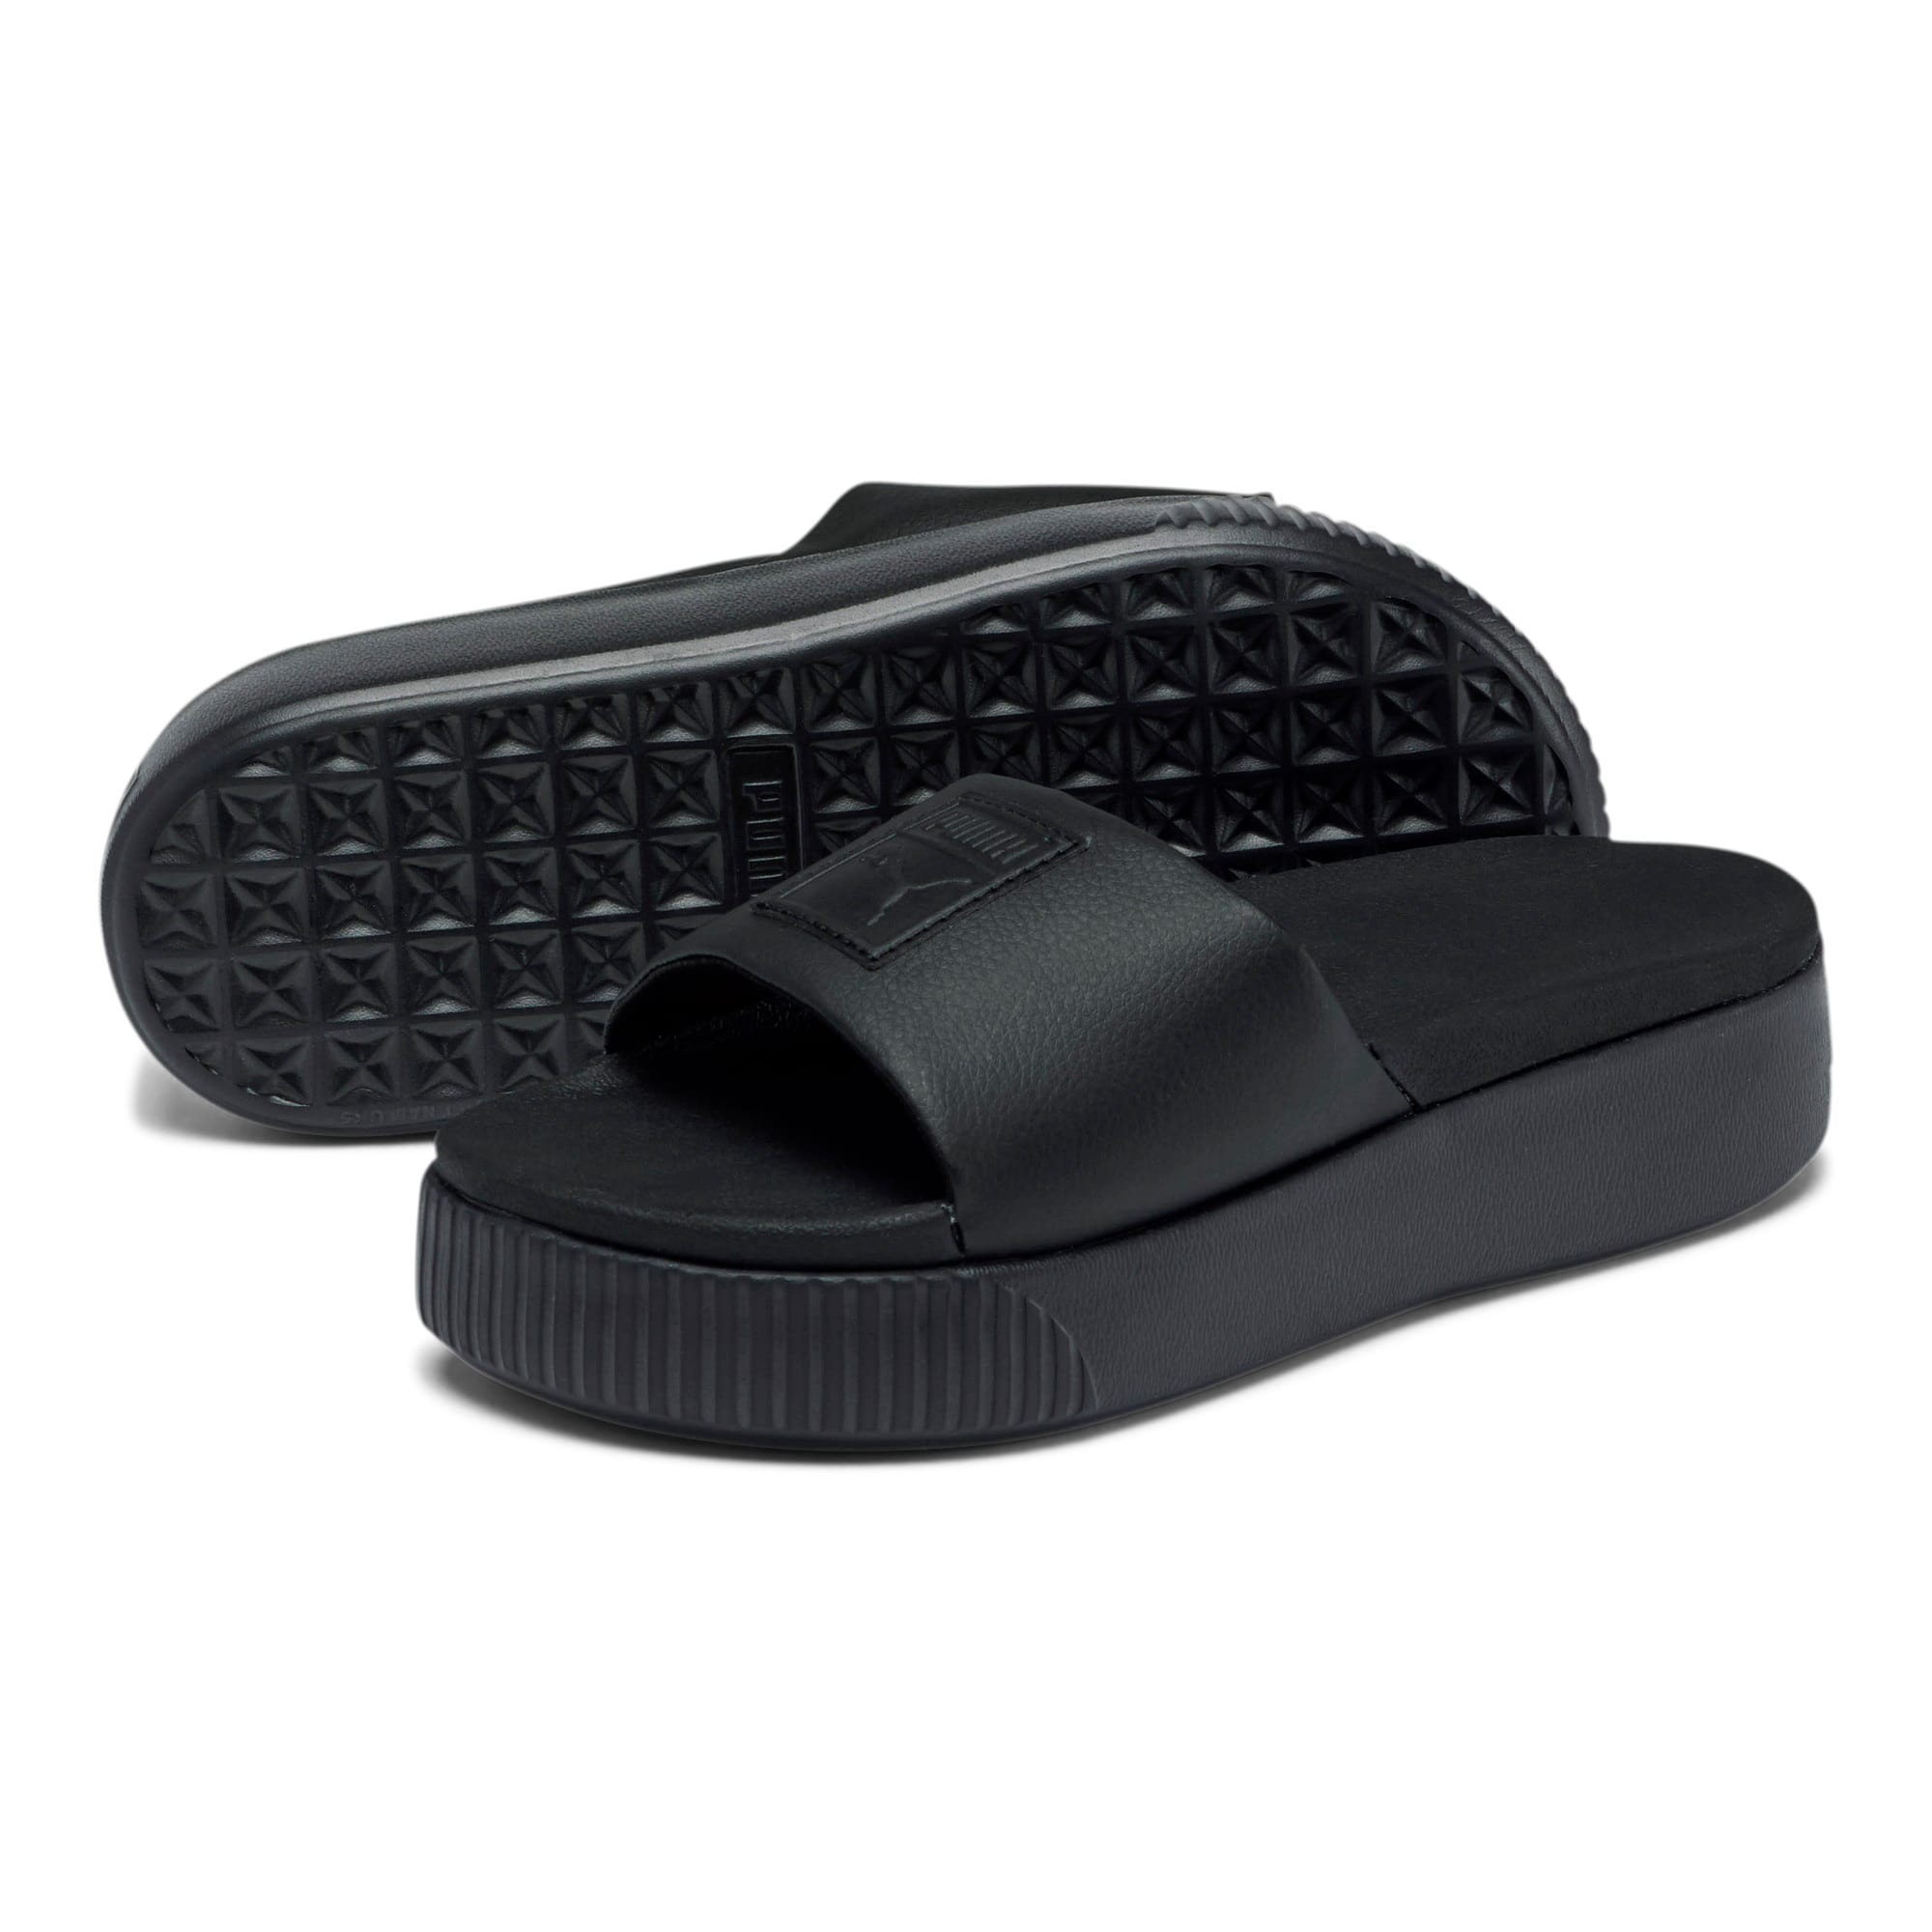 Thumbnail 2 of Platform Slide Women's Sandals, Puma Black-Puma Black, medium